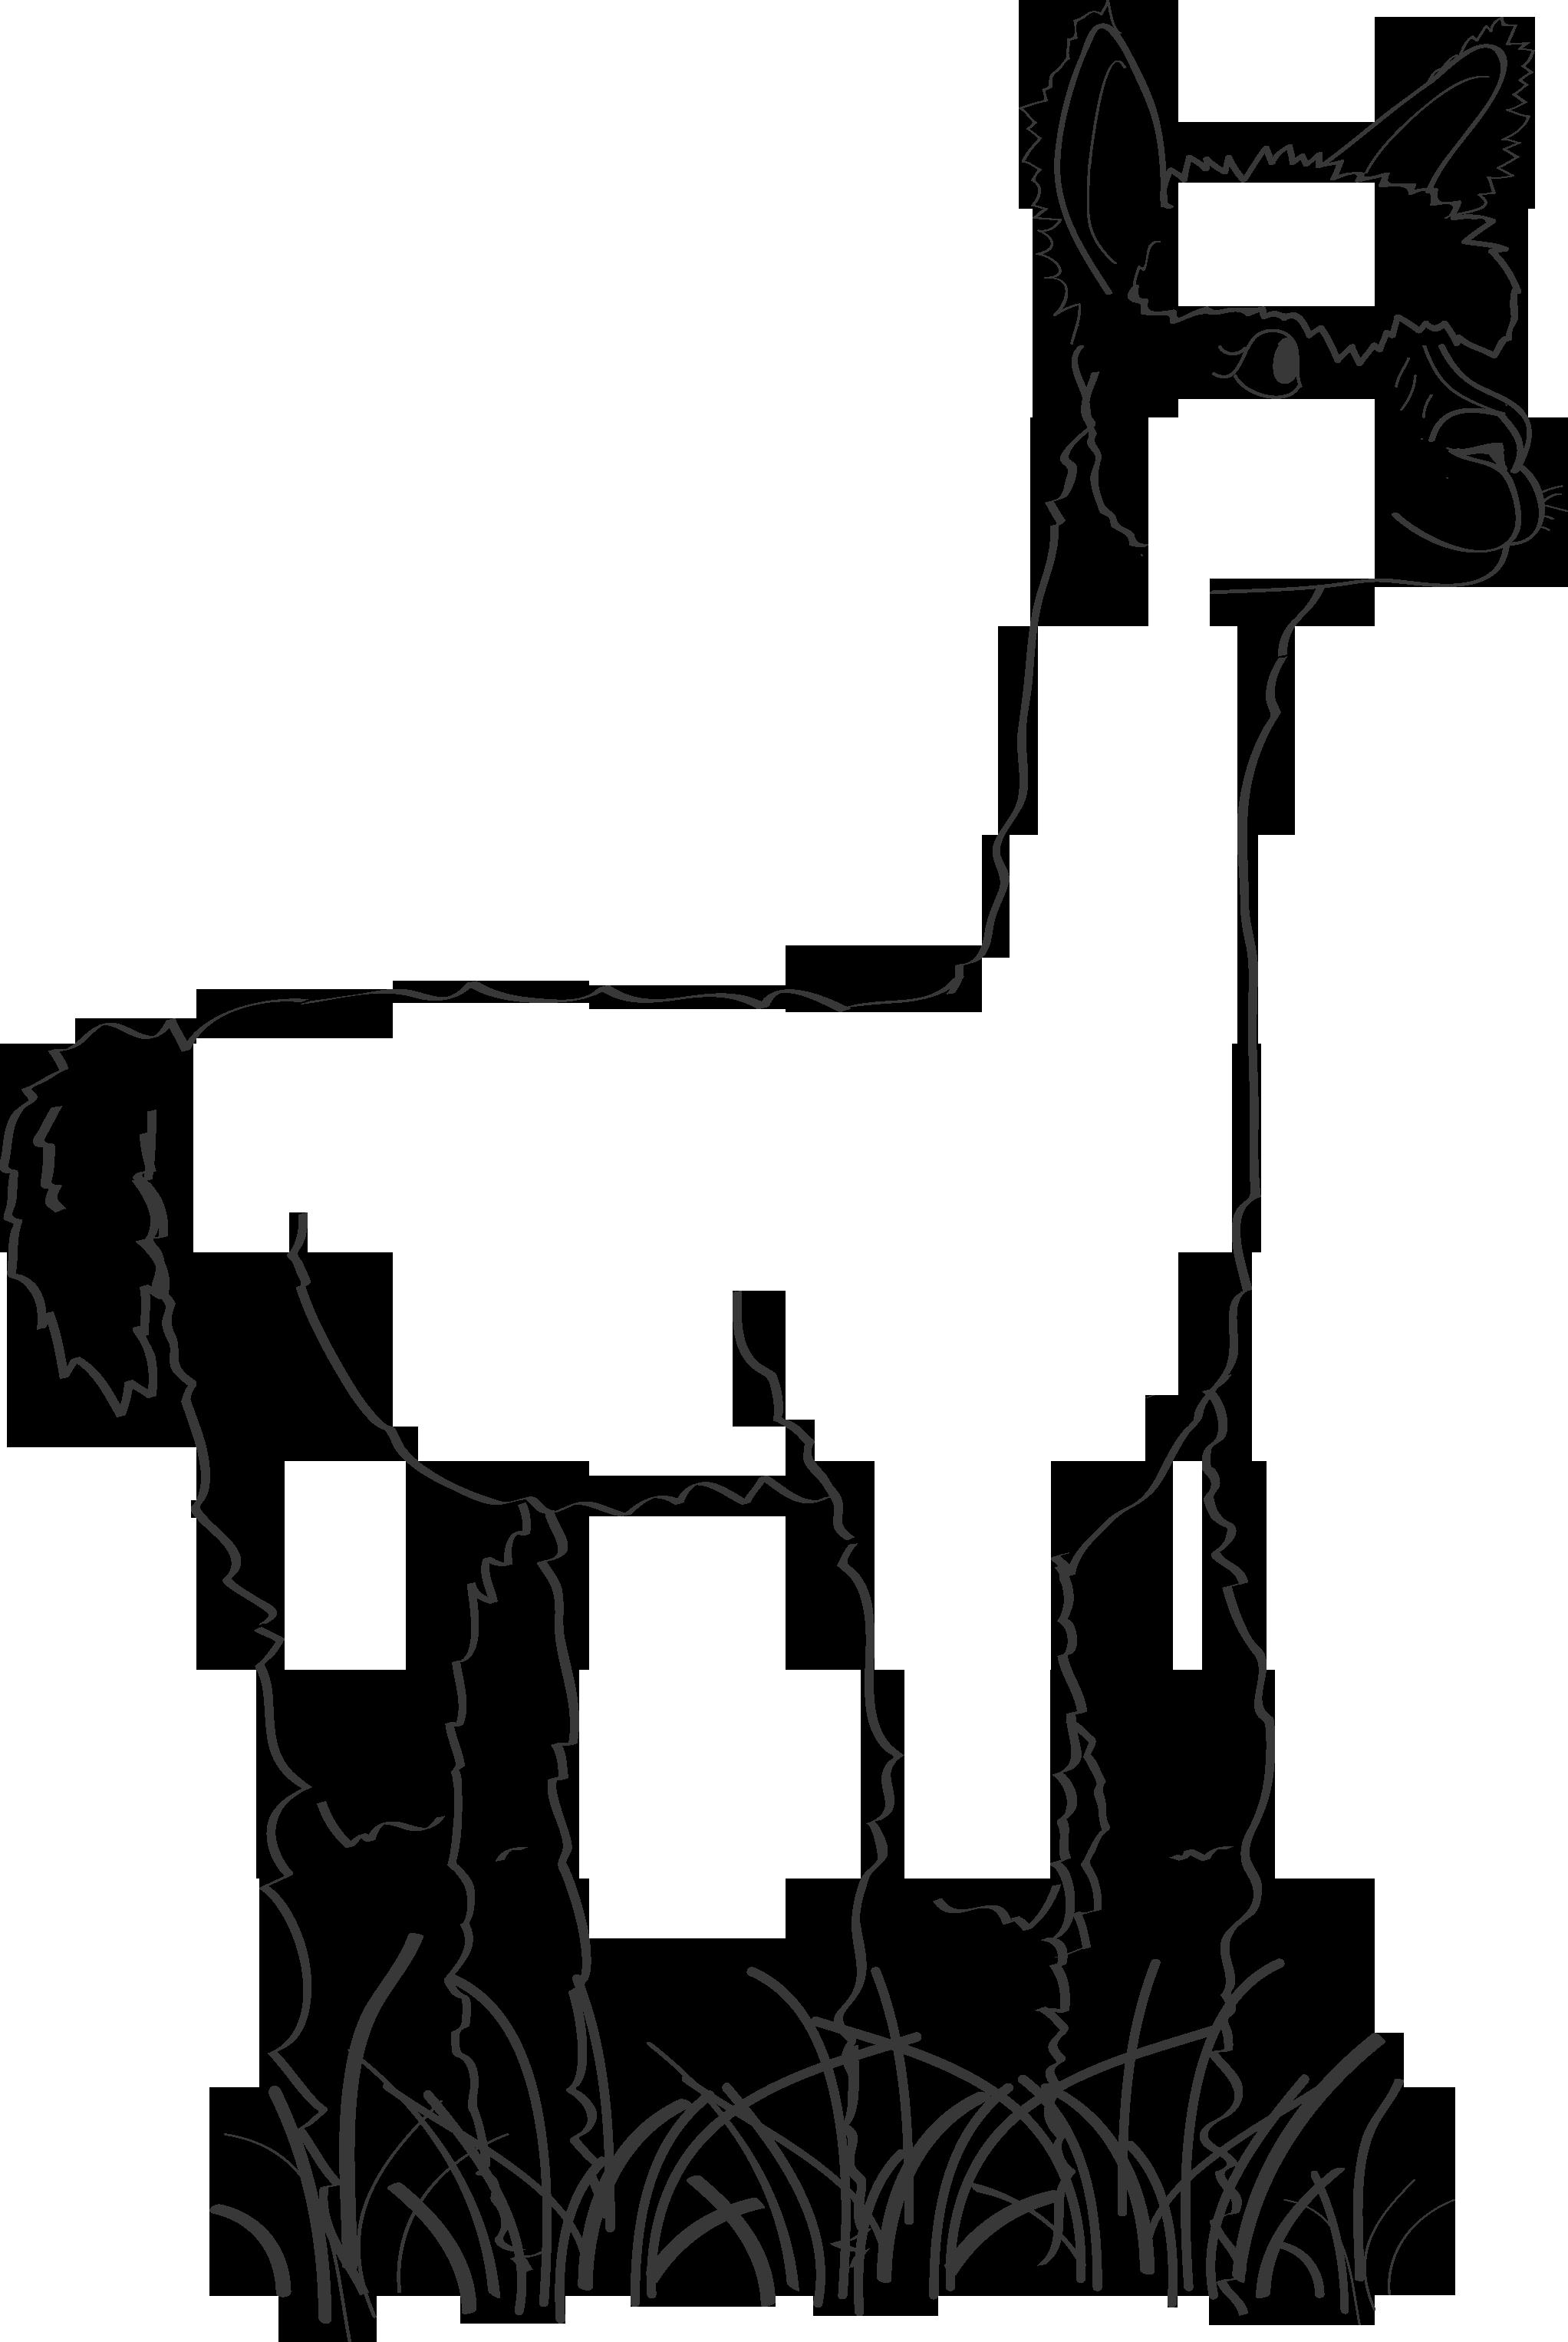 Head clipart alpaca. Line drawing at getdrawings